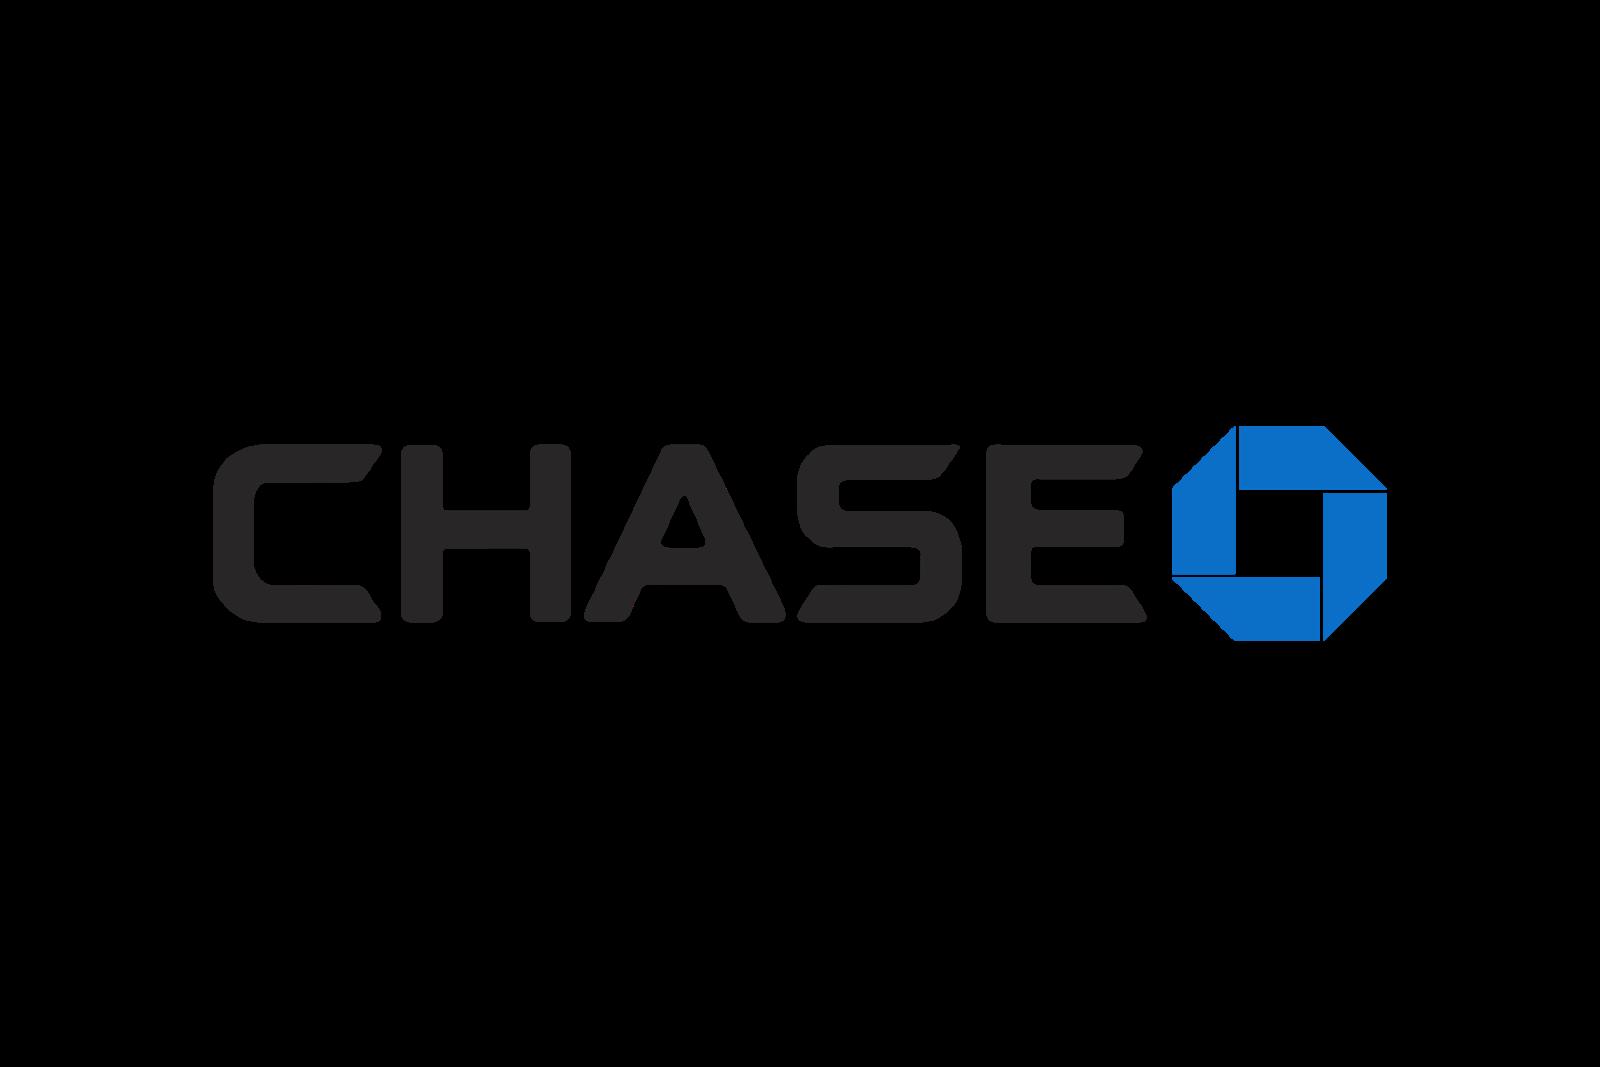 Logo Chase_Bank.png